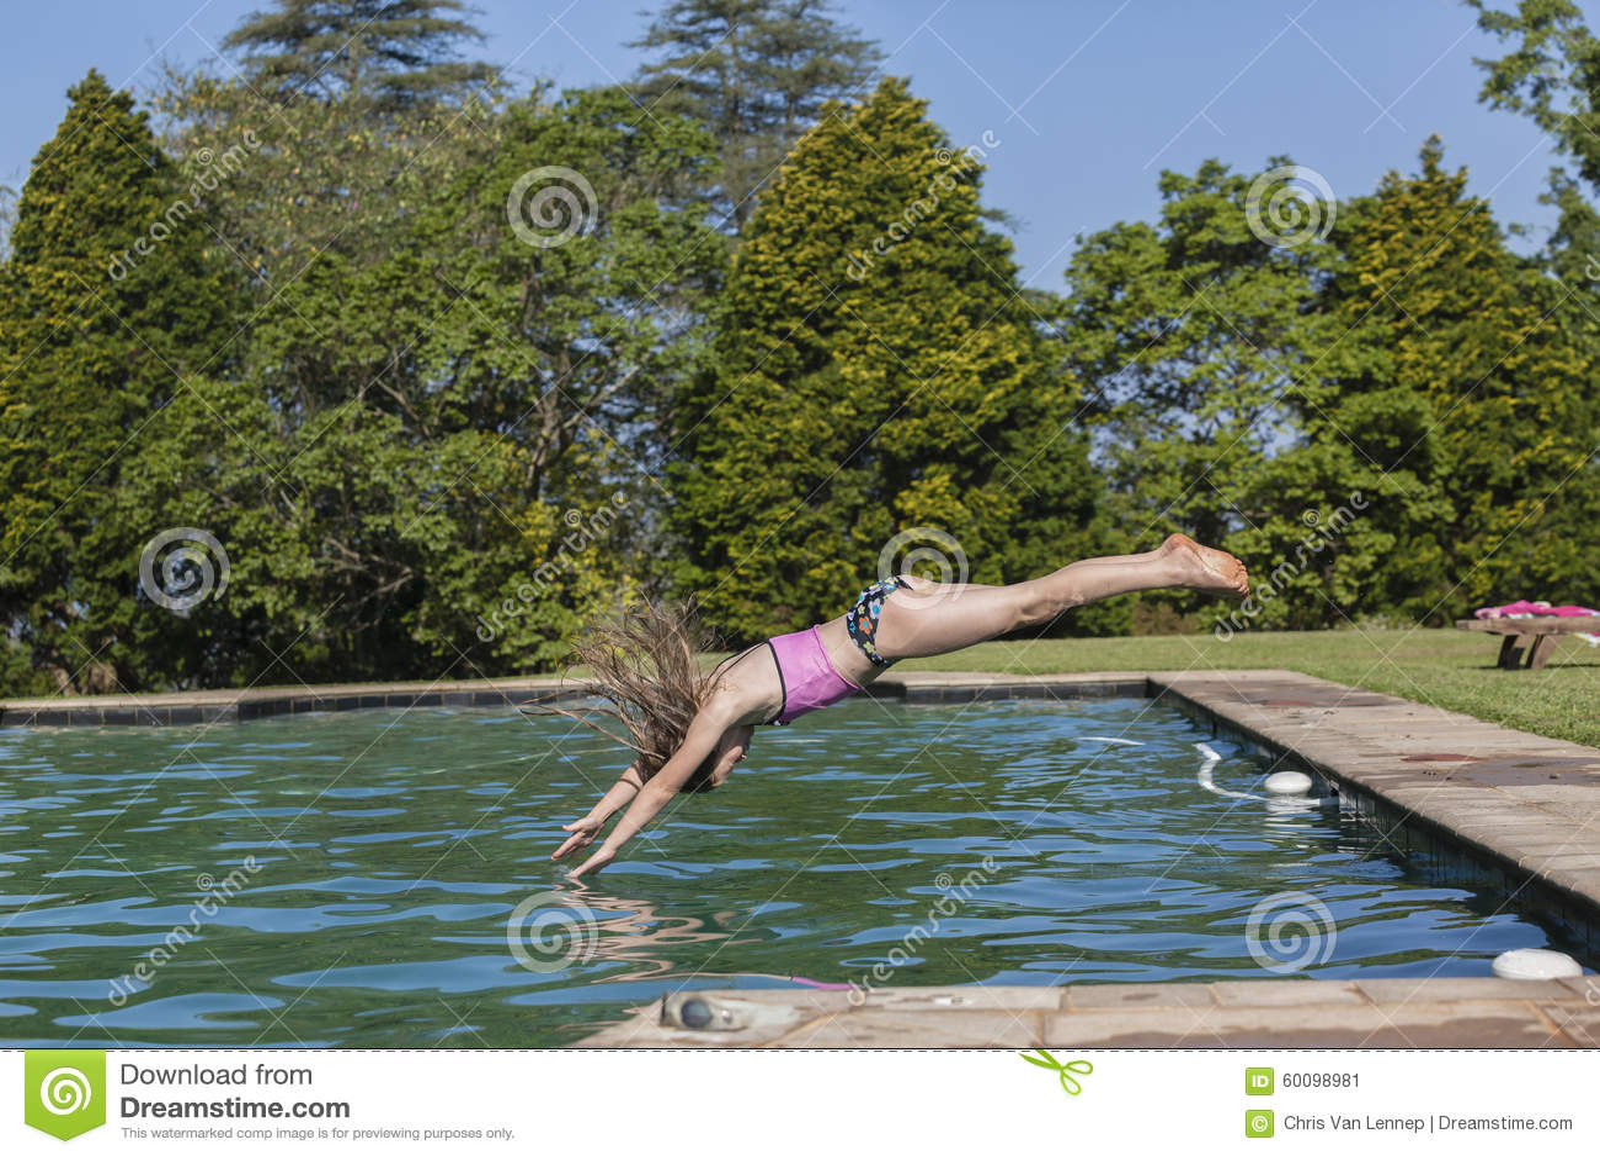 Girl Diving Pool Stock Image Image Of Pool Home Photo